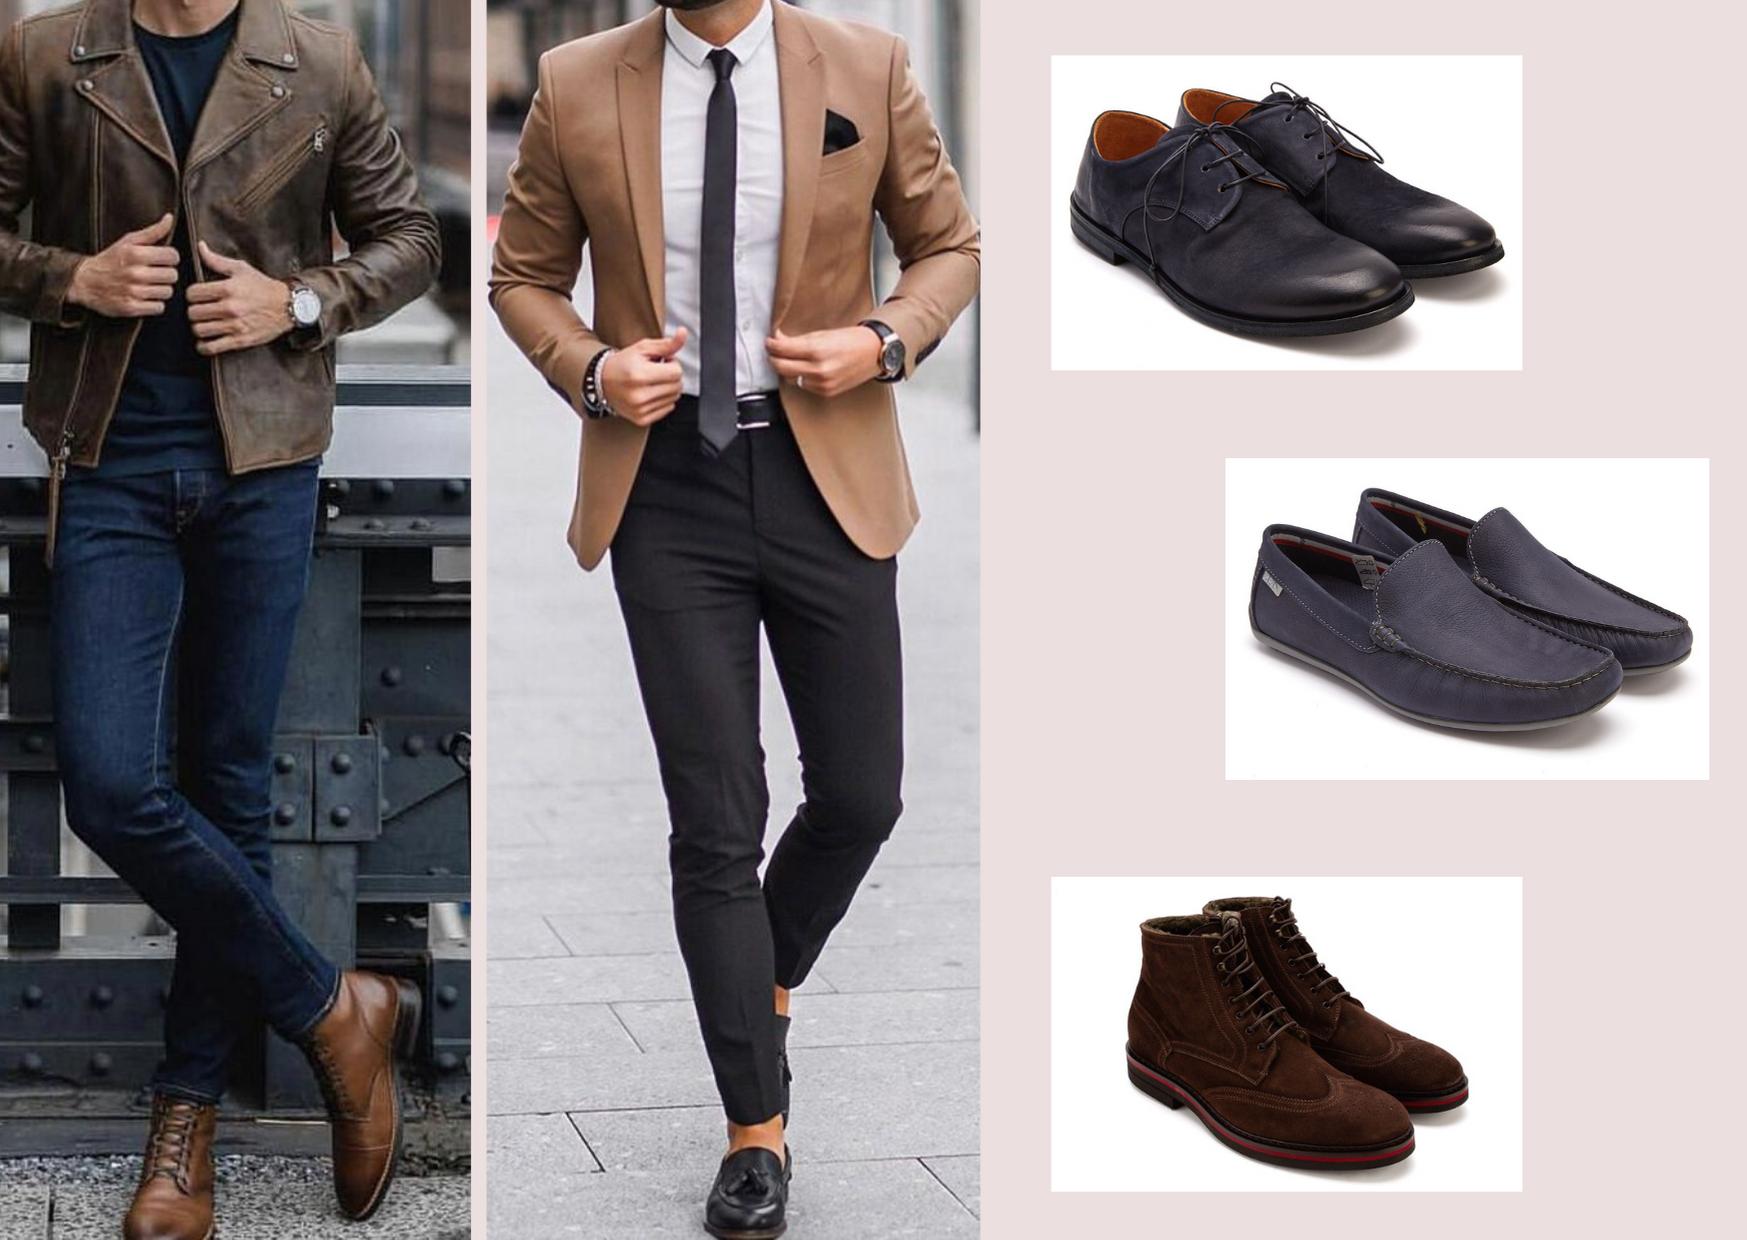 modne-buty-meskie-klasyczne